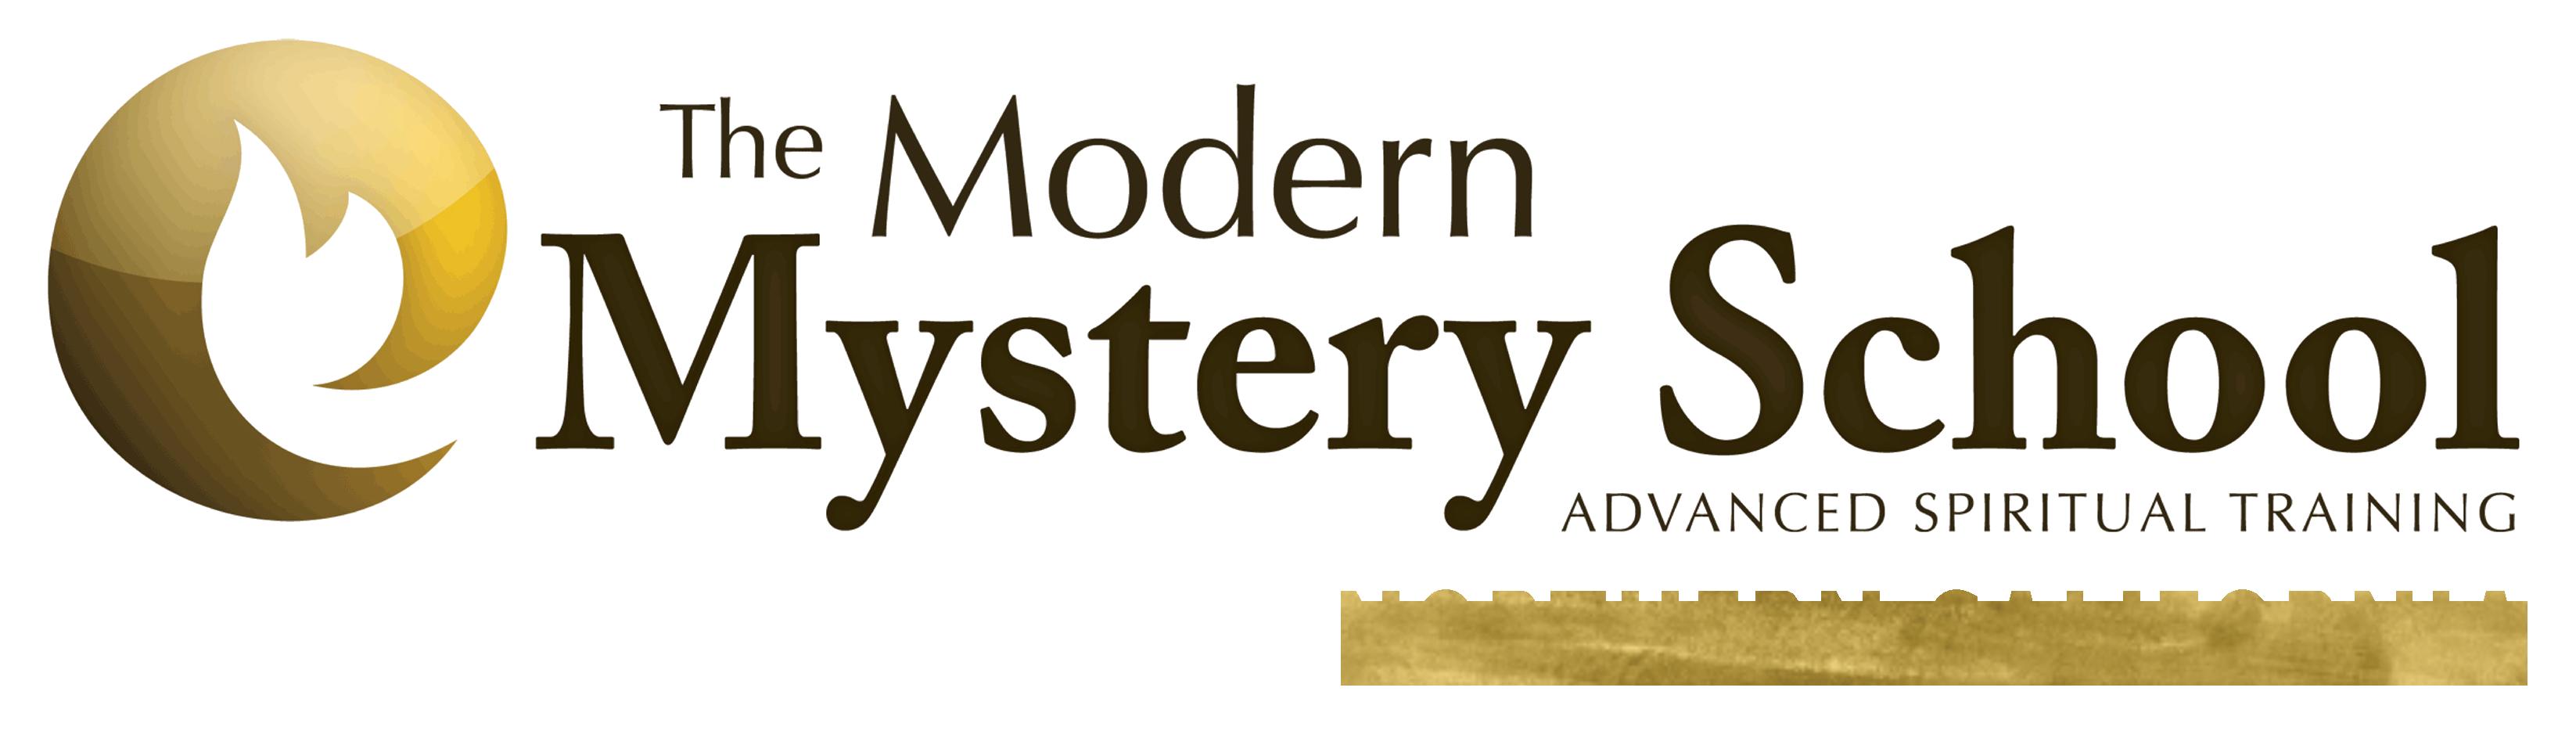 Modern Mystery School NorCal